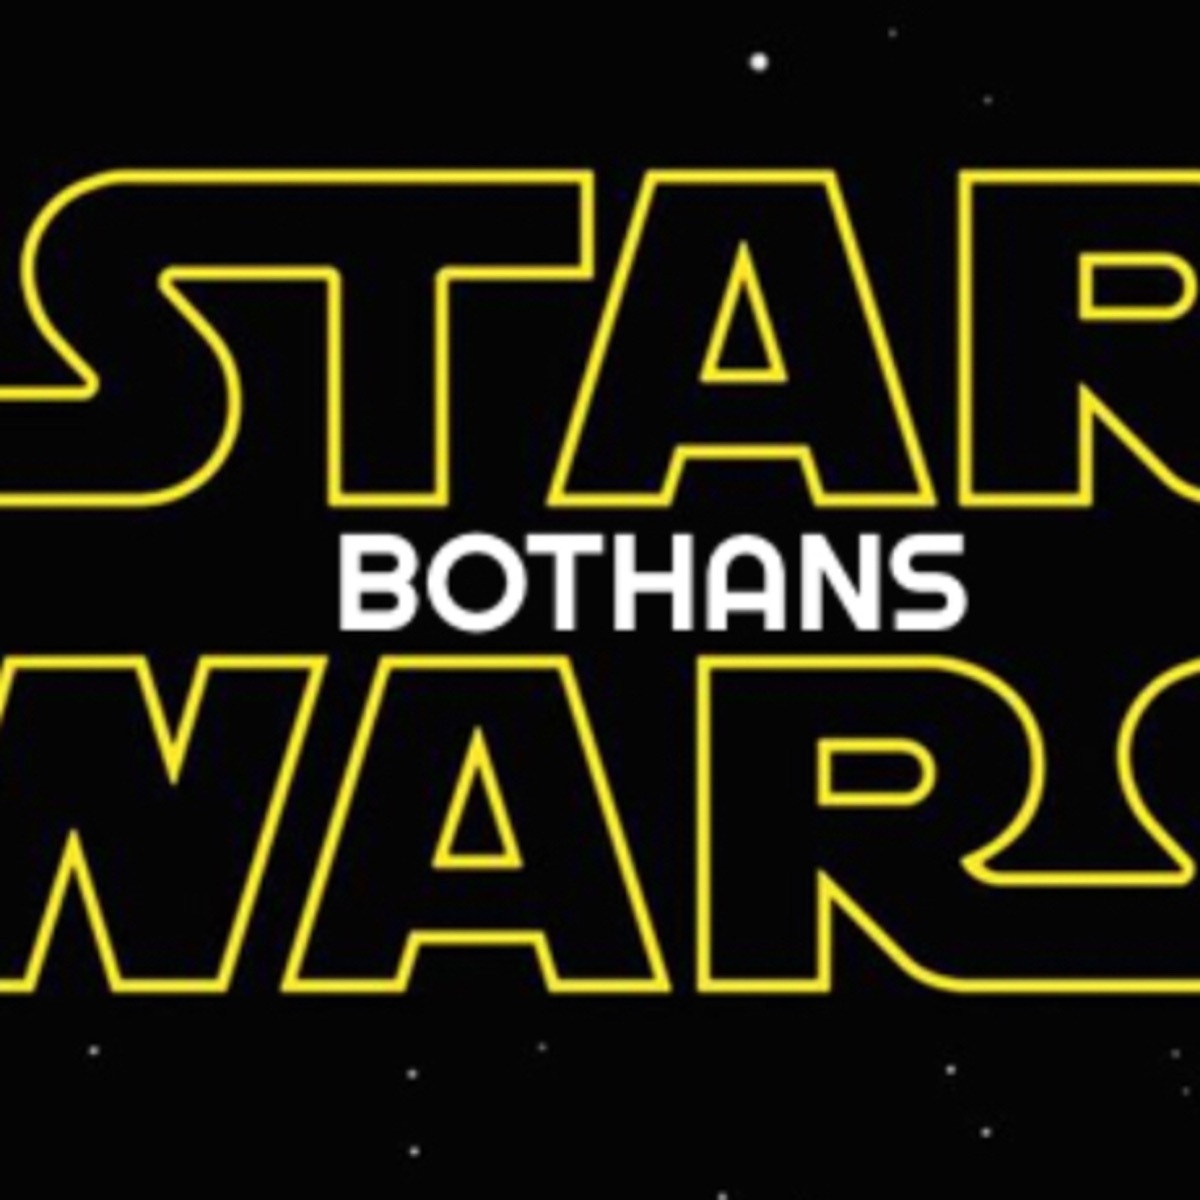 Star Wars: Bothans